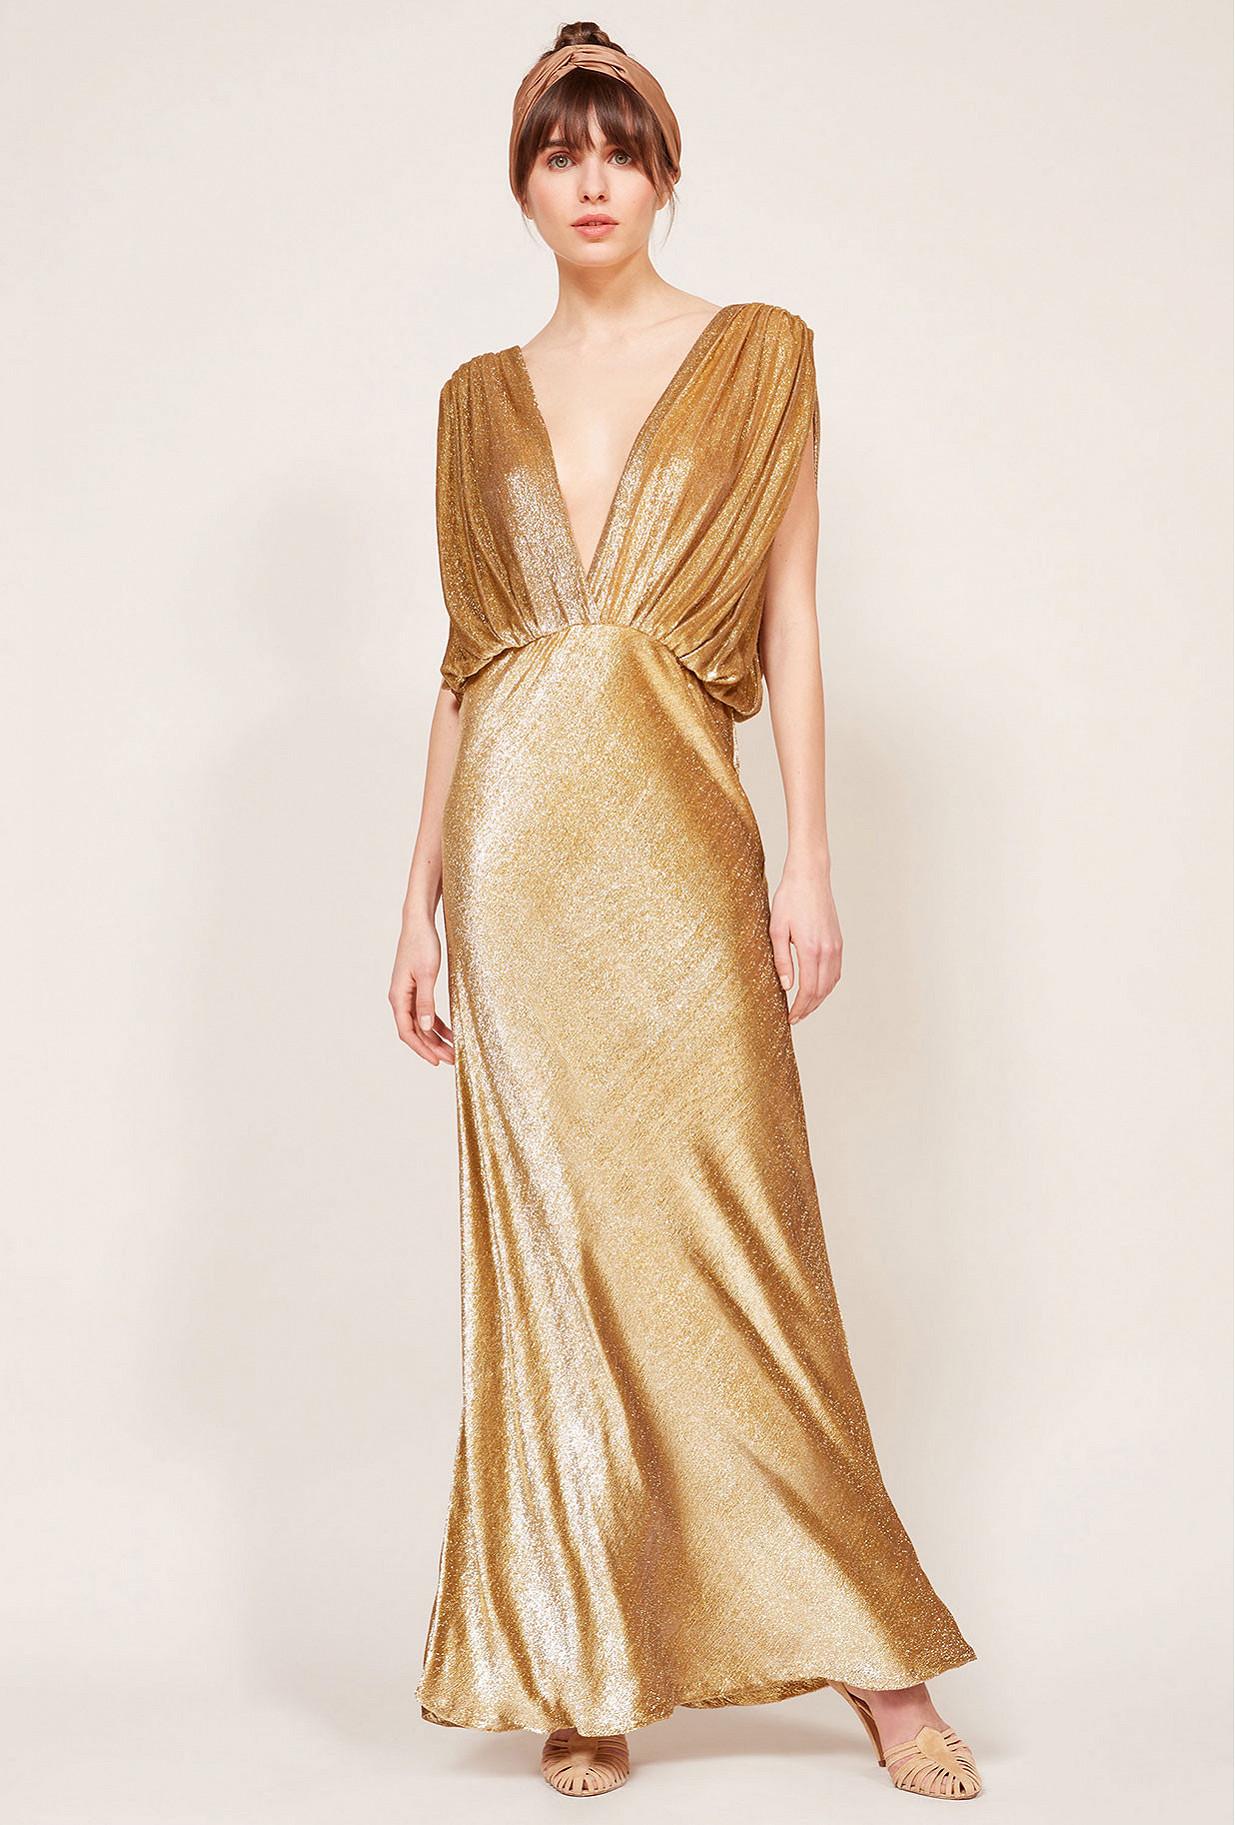 Gold Dress Helen Mes Demoiselles Paris